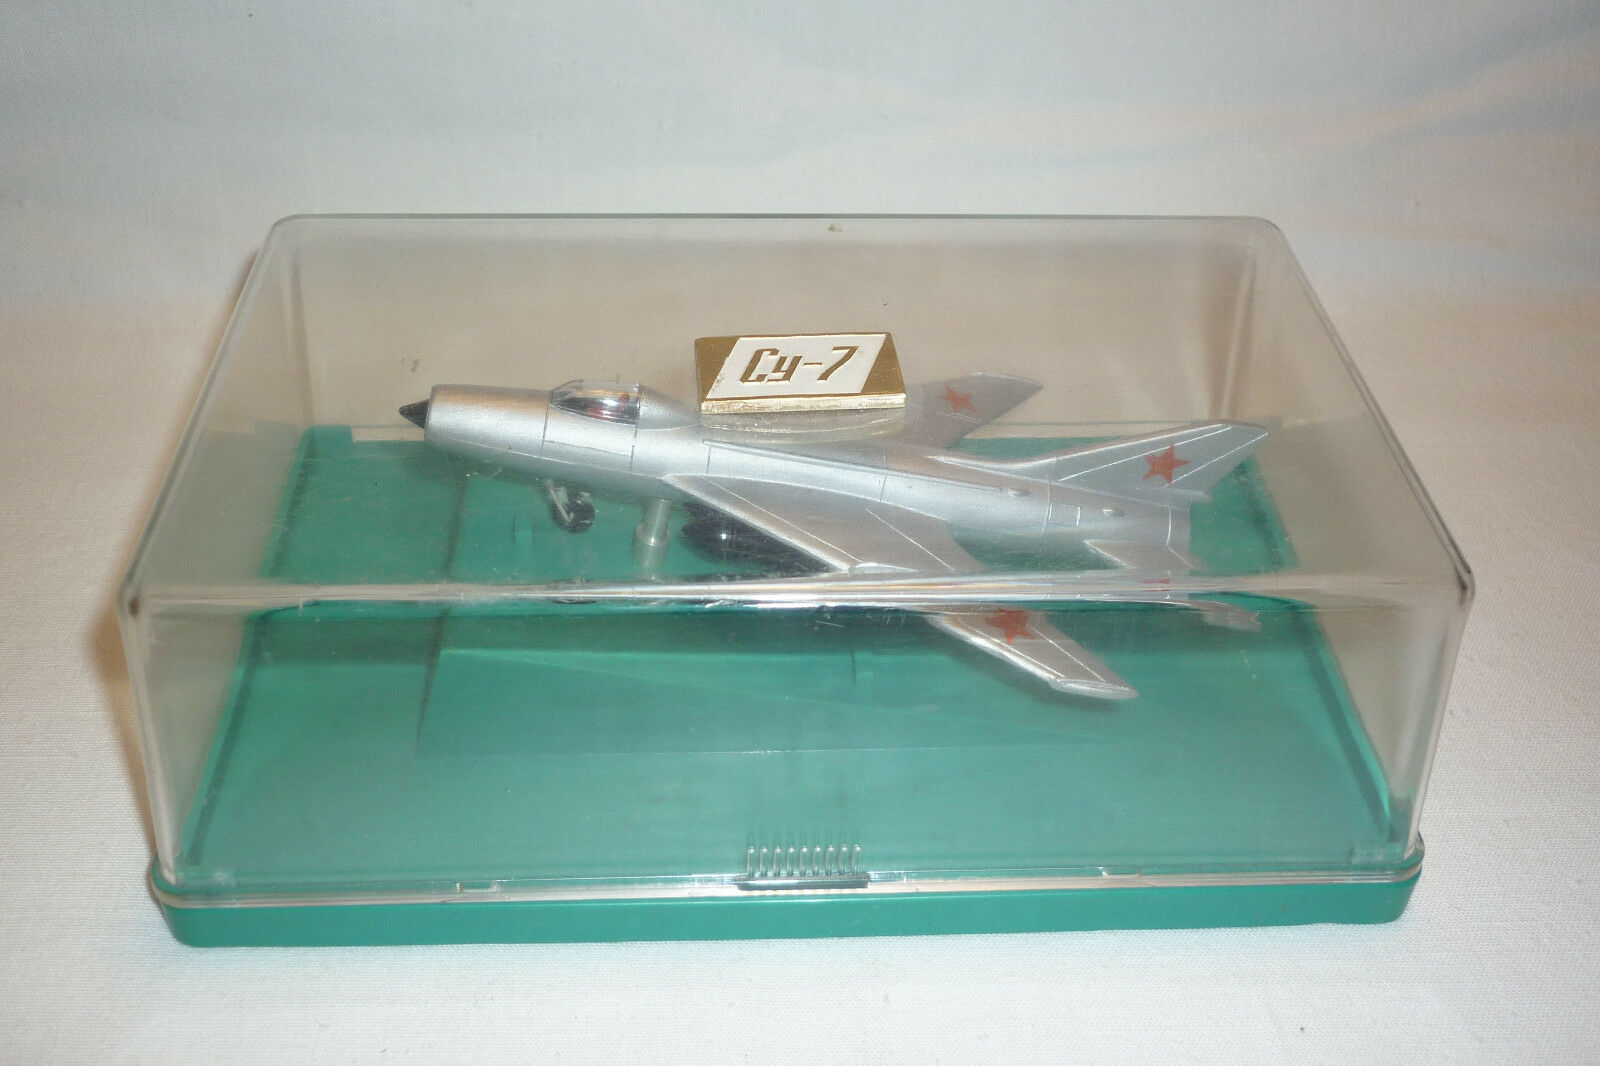 VINTAGE - Aeroplano GETTO cy-7 - NO REPLICA (dinky-t-9)